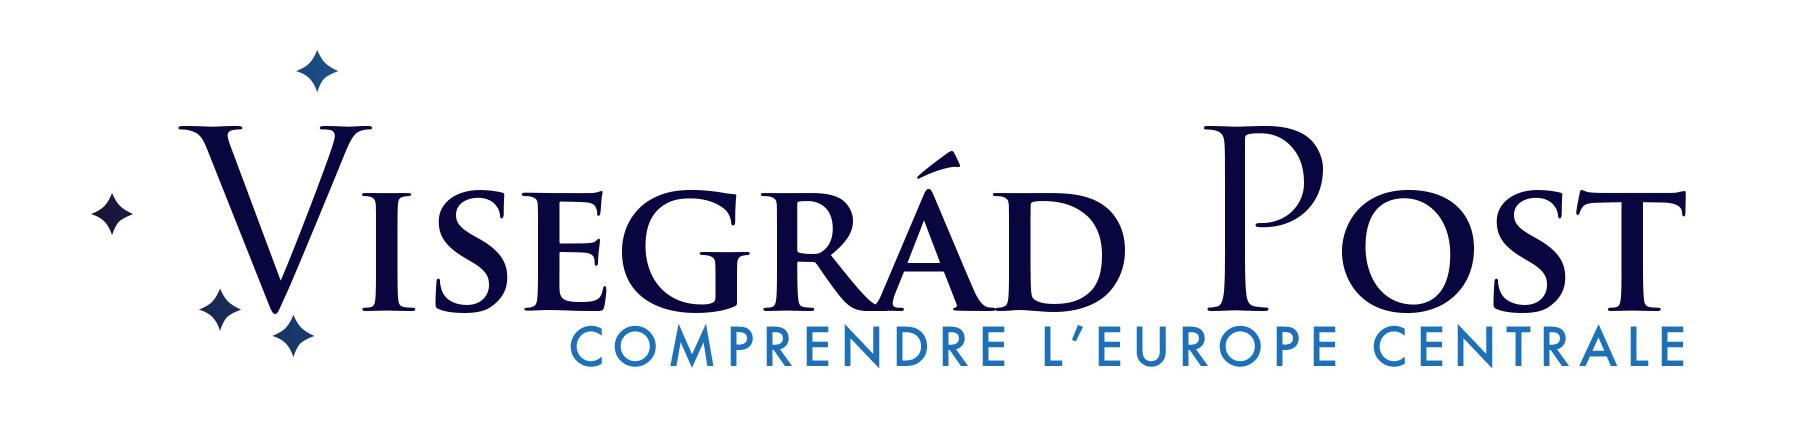 https://visegradpost.com/wp-content/themes/blabber/logos/fr-Logo-Visegrad-Post_crop.jpg